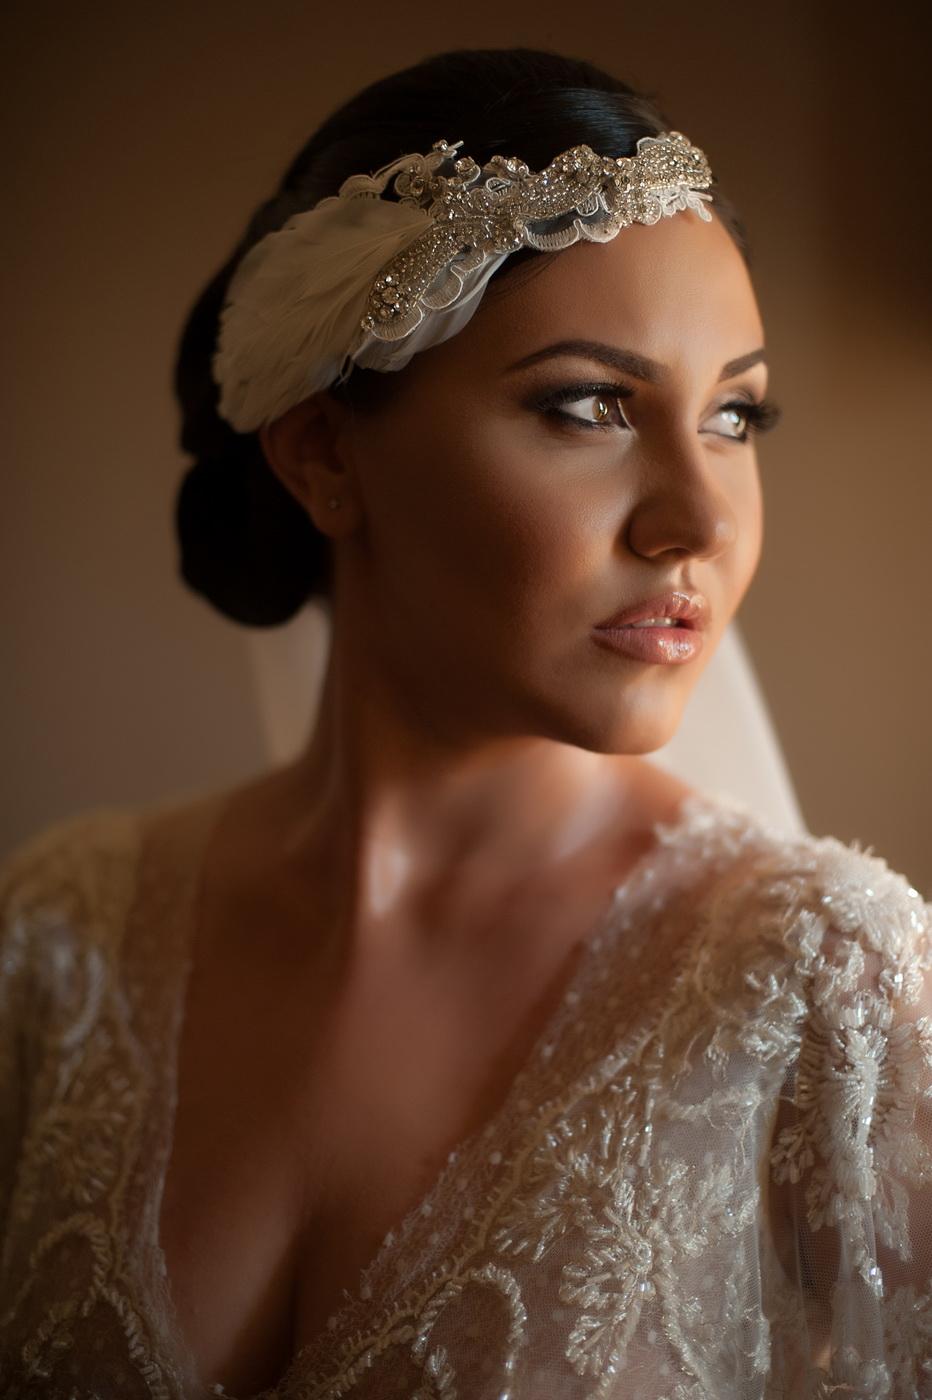 Destination Wedding Photographer_Marian Sterea_119.jpg